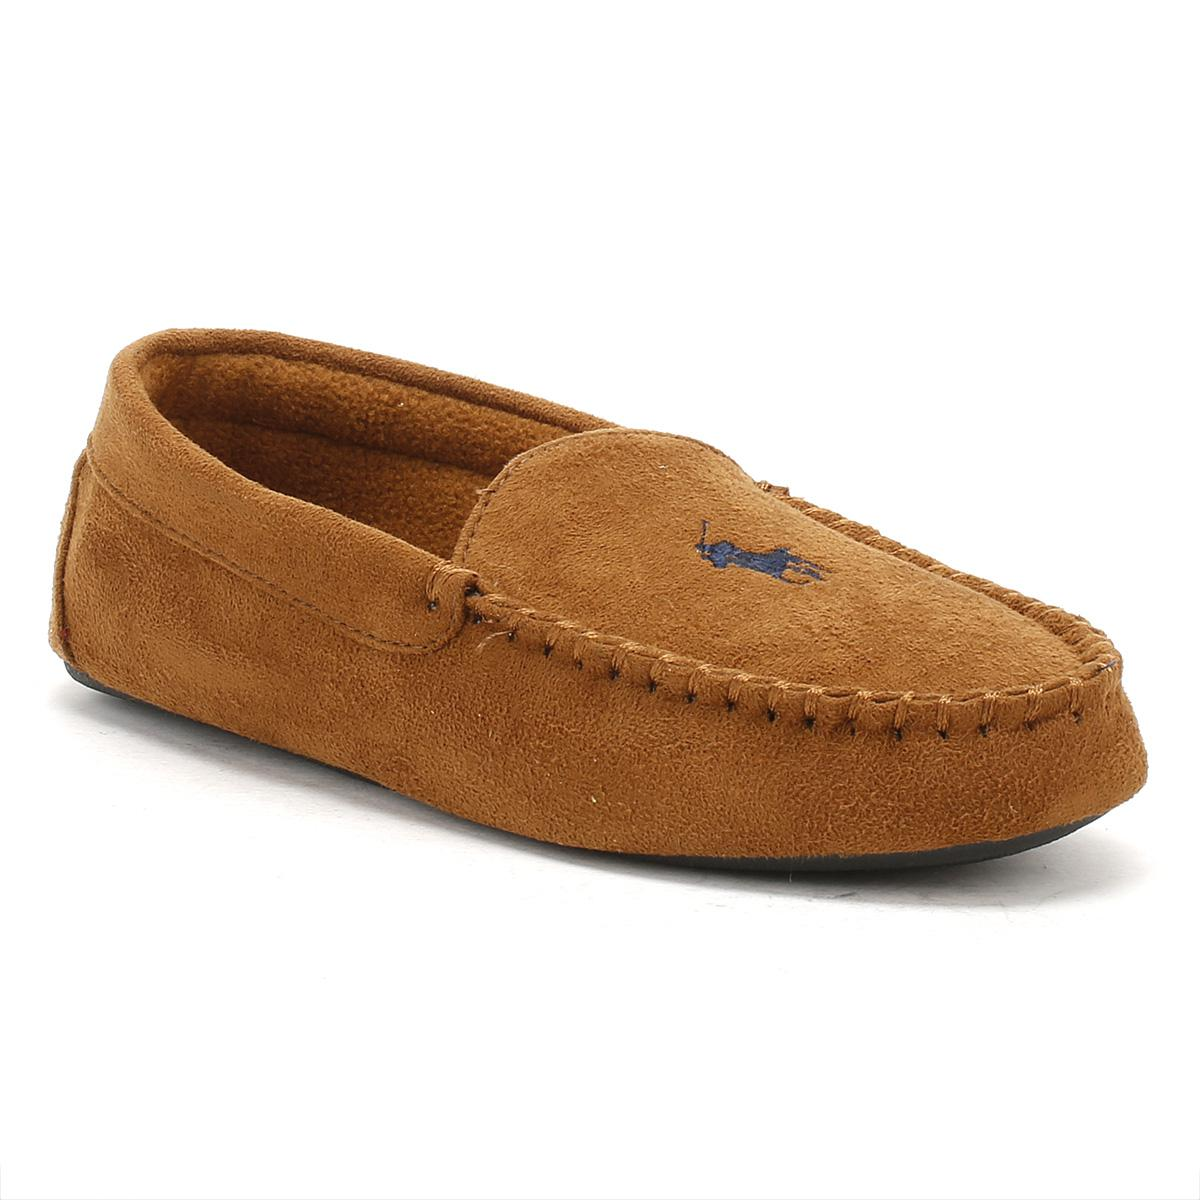 1a884c84767d Ralph Lauren Mens Snuff Tan   Navy Dezi Ii Moccasin Slippers in ...